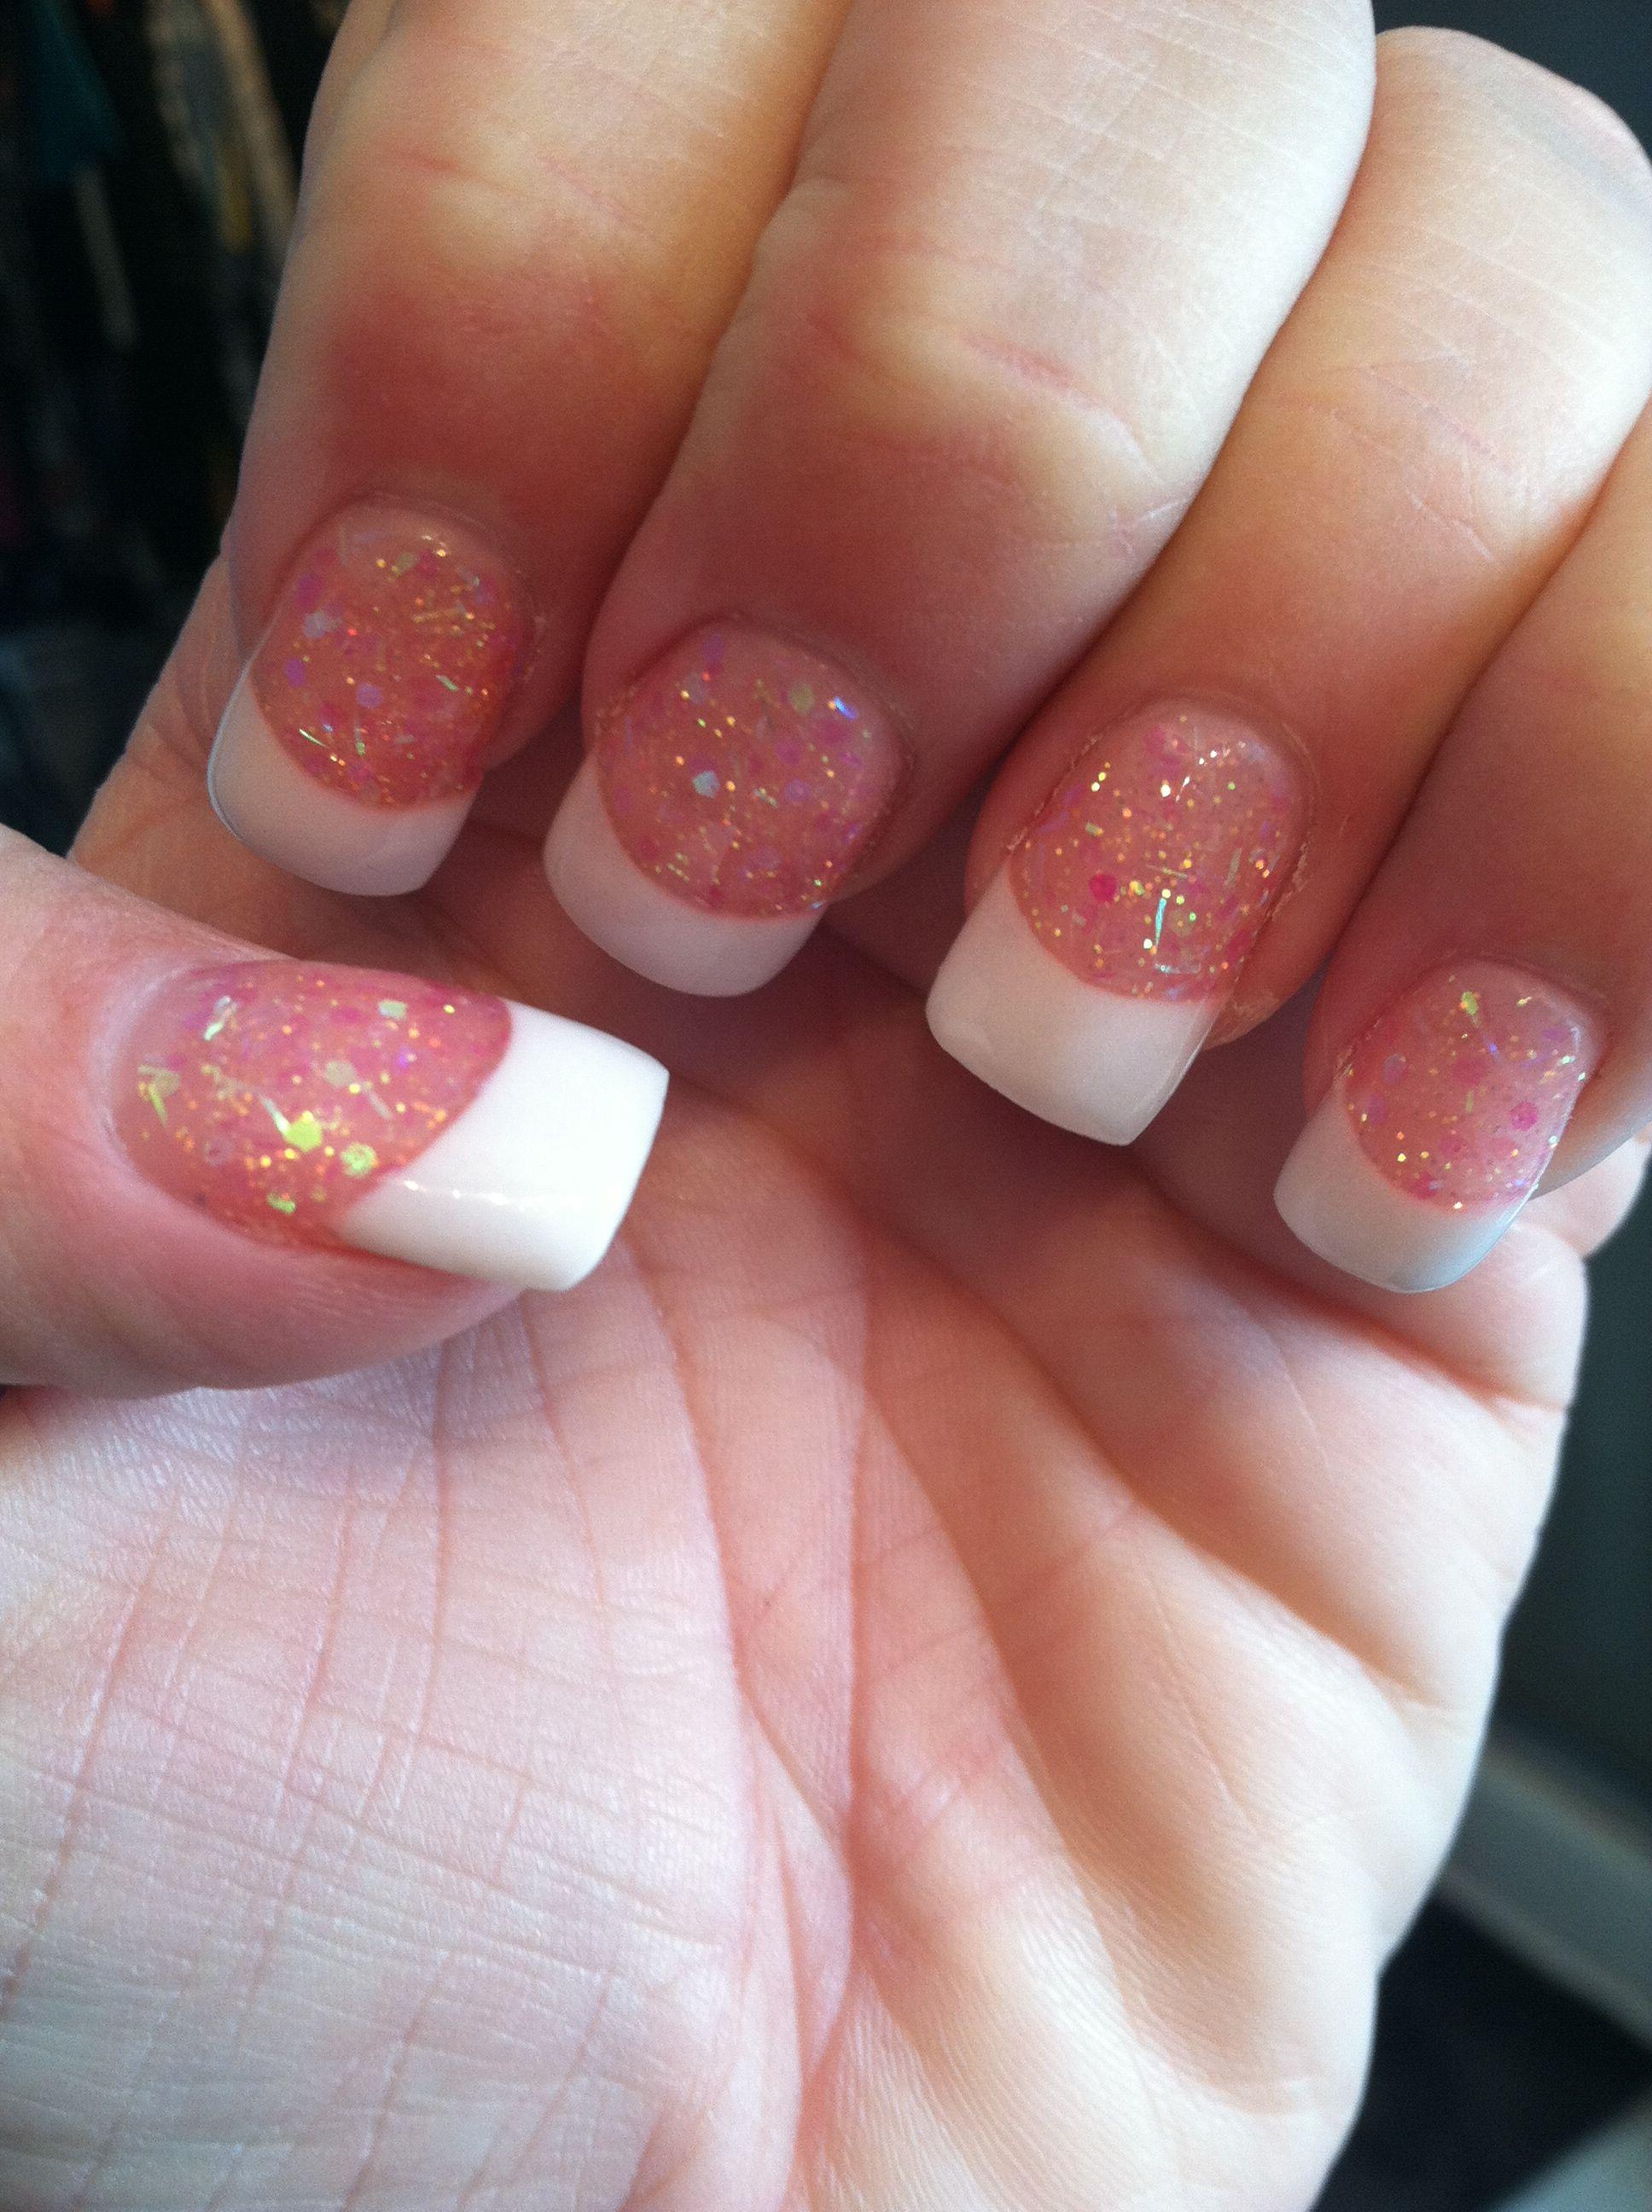 French Manicure with pink glitter! | Nailzzz | Pinterest | Pink ...